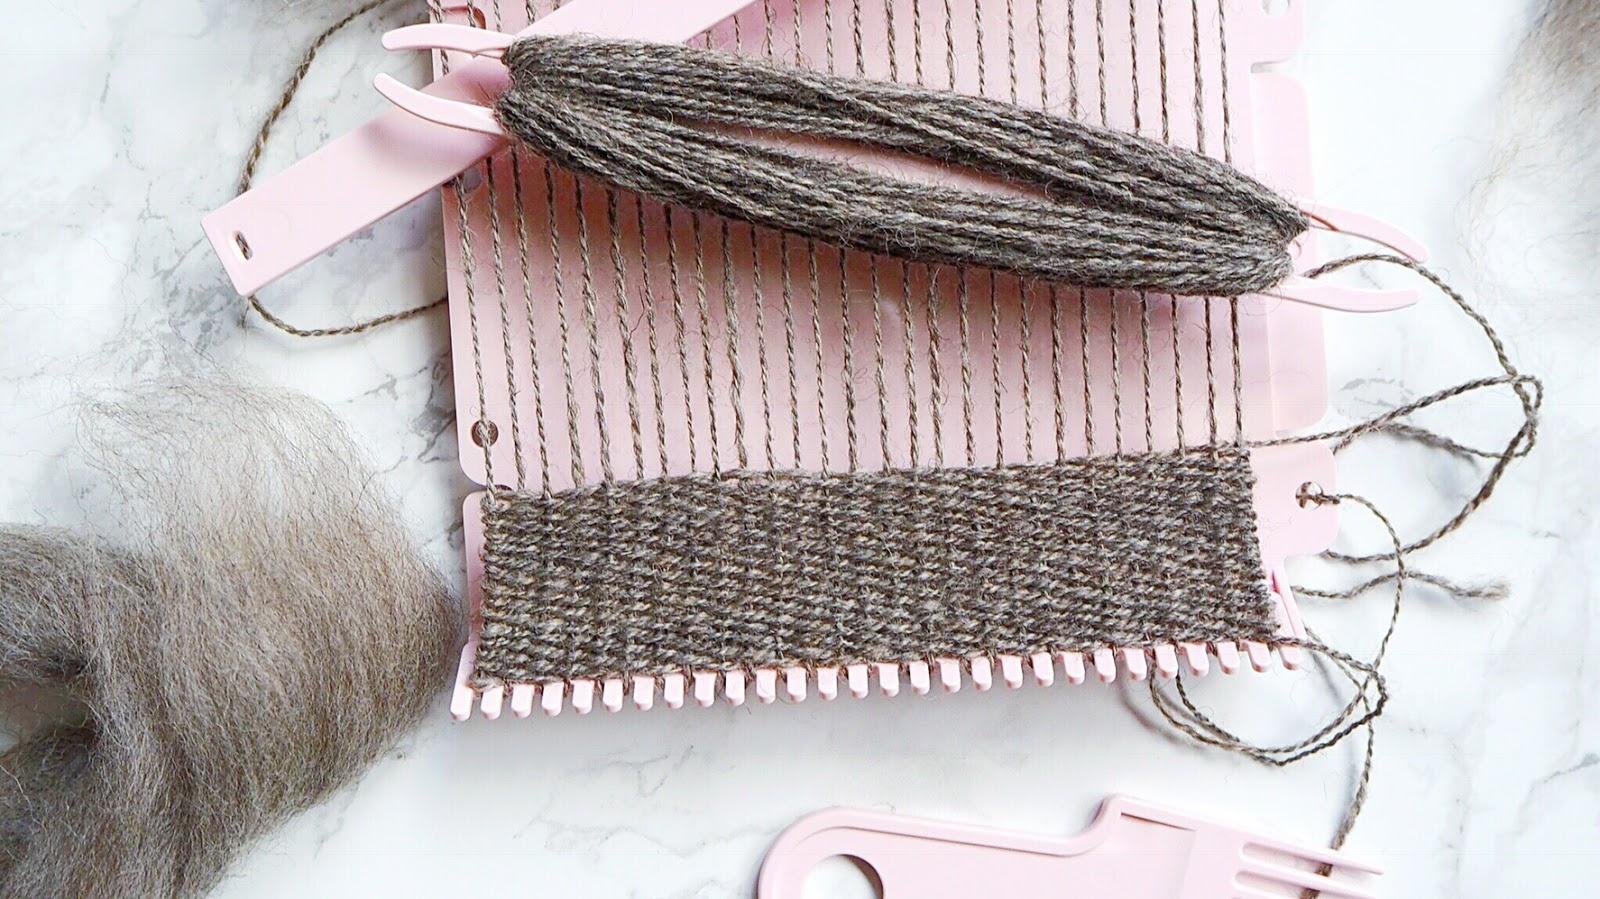 Clover Miniwebrahmen (Mini loom) mit handgesponnenem Garn